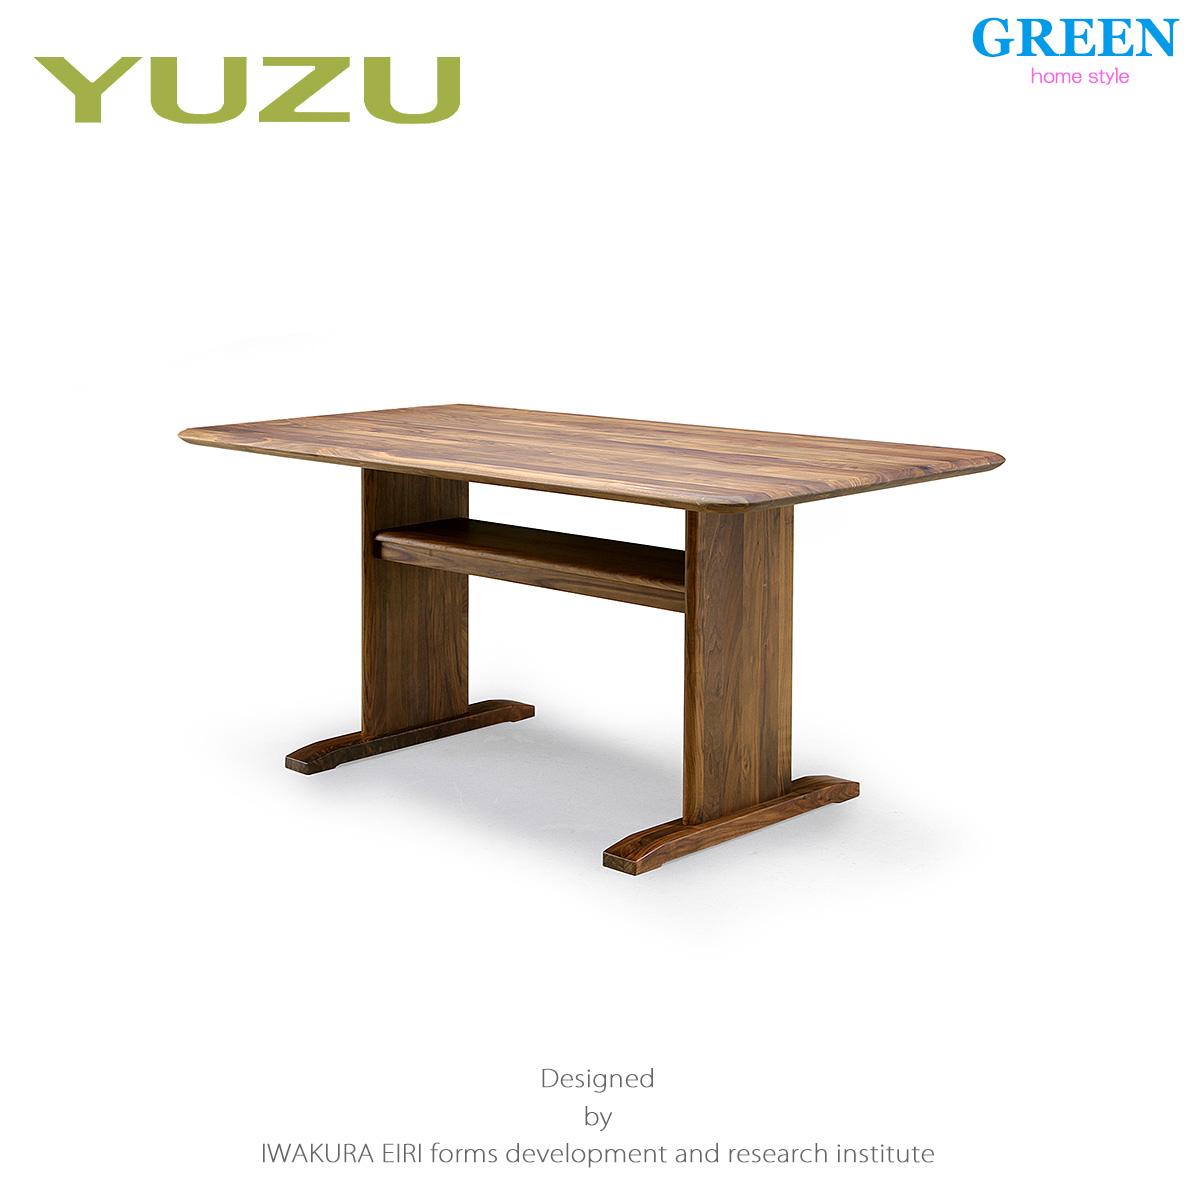 37%OFF GREEN home style YUZU SOFA LD TABLE (グリーン ホームスタイル ユズ リビングダイニング テーブル) ダイニングテーブル Designed by IWAKURA EIRI 岩倉 榮利 イワクラ エイリ (ウォールナット材)【同梱不可】